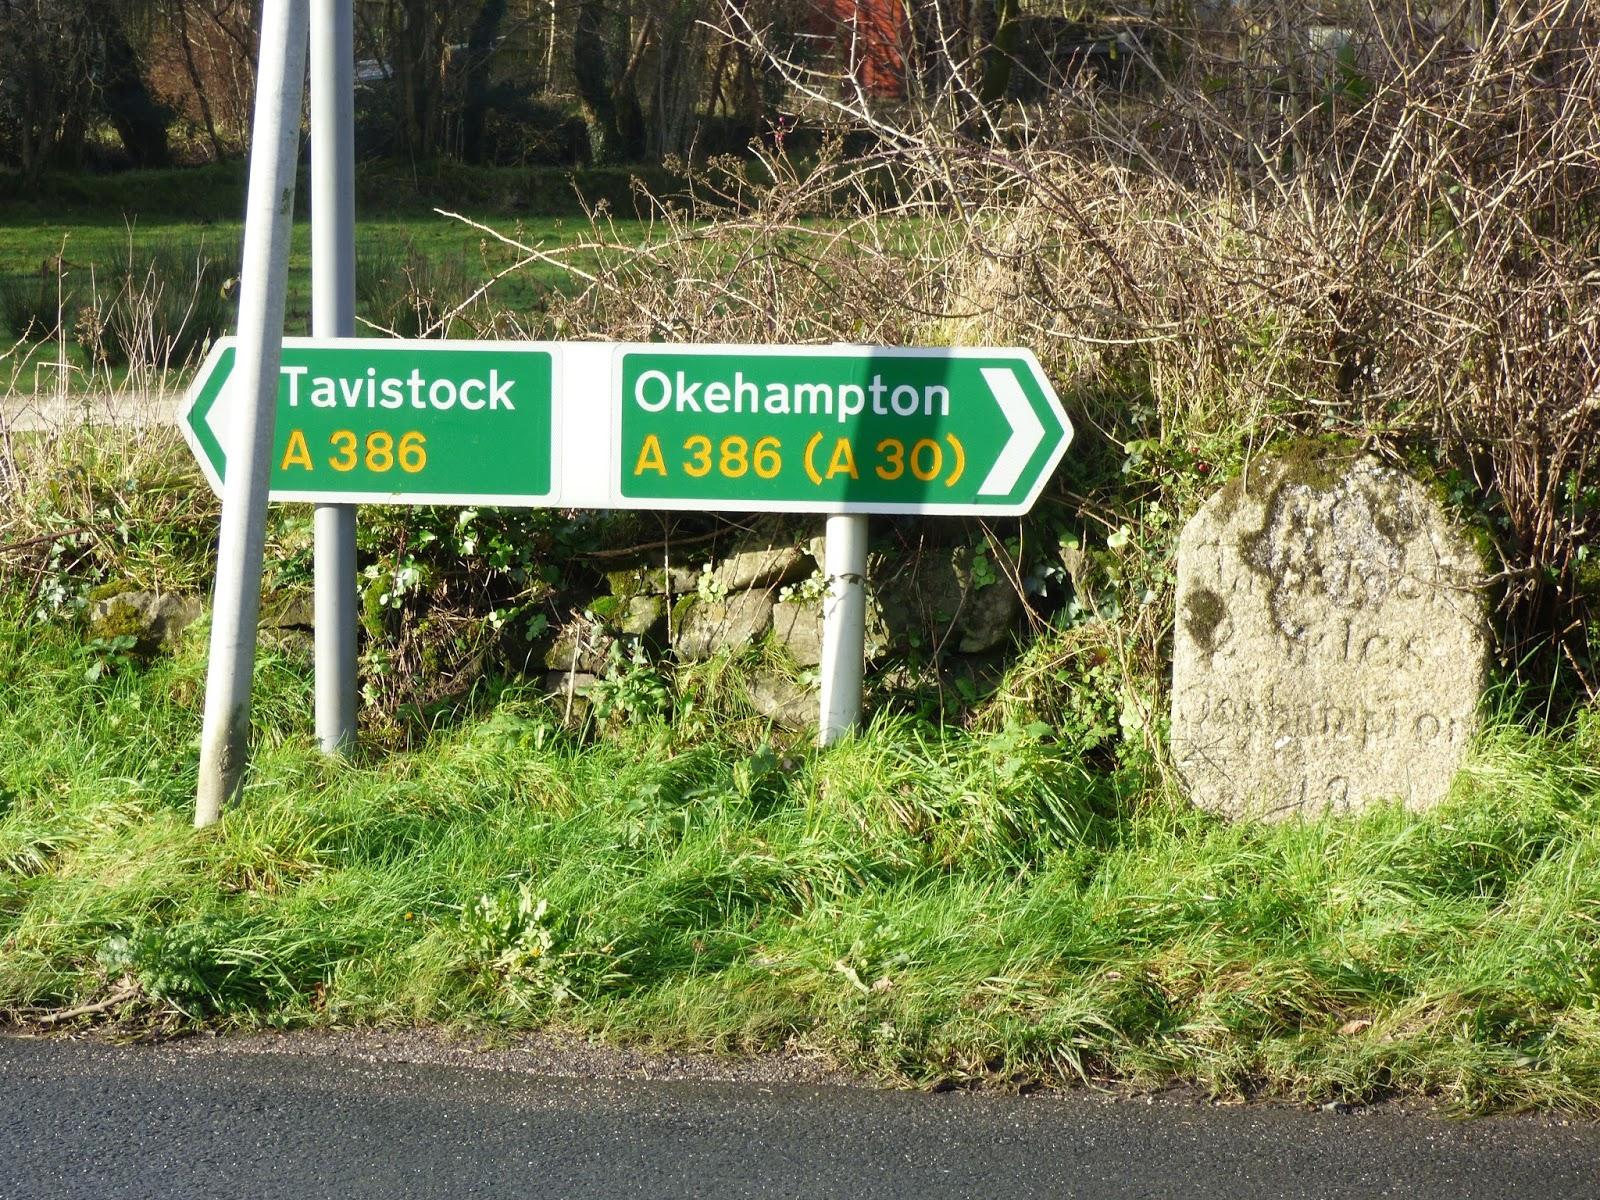 Drawn toad road milestone Years Milestones signposts know I